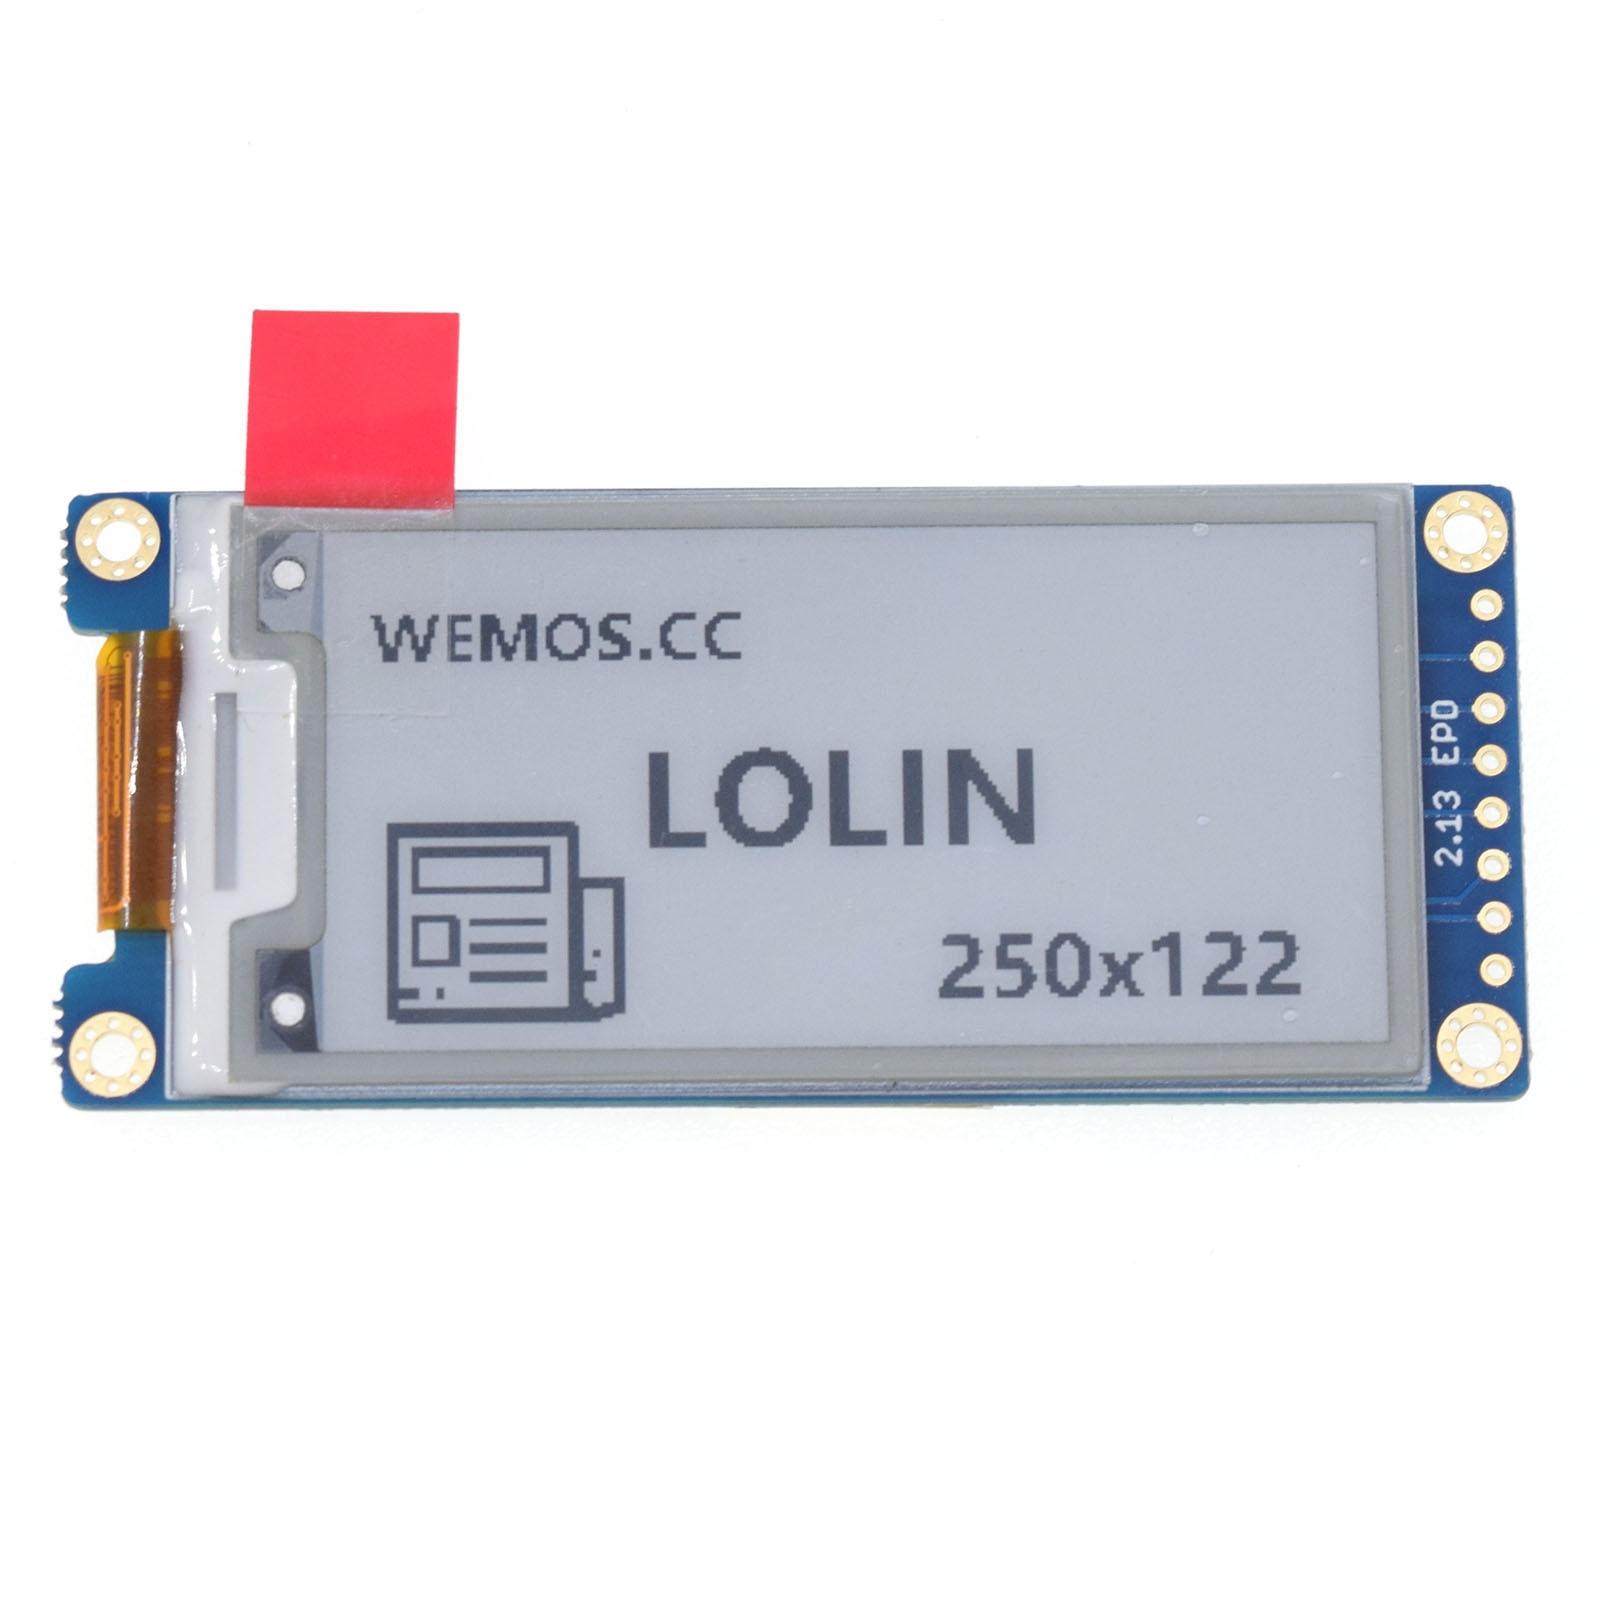 EPaper 2.13 Shield V1.0.0 For LOLIN (WEMOS) D1 Mini D32 - 2.13 Inch 250X122 SPI EPaper/eInk Module IL3897